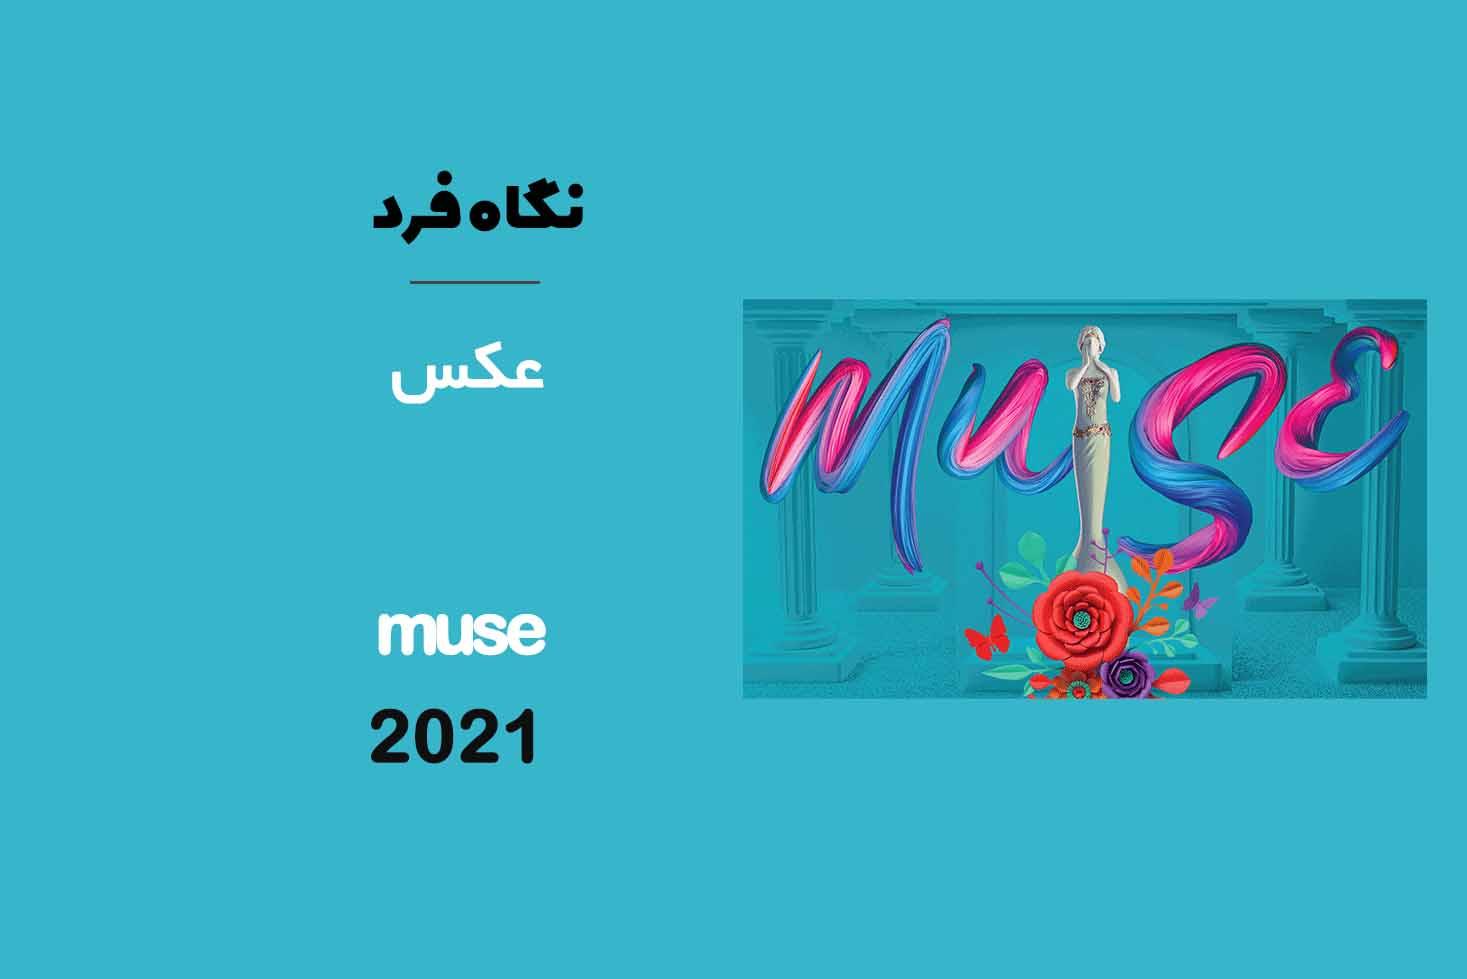 Muse 2021